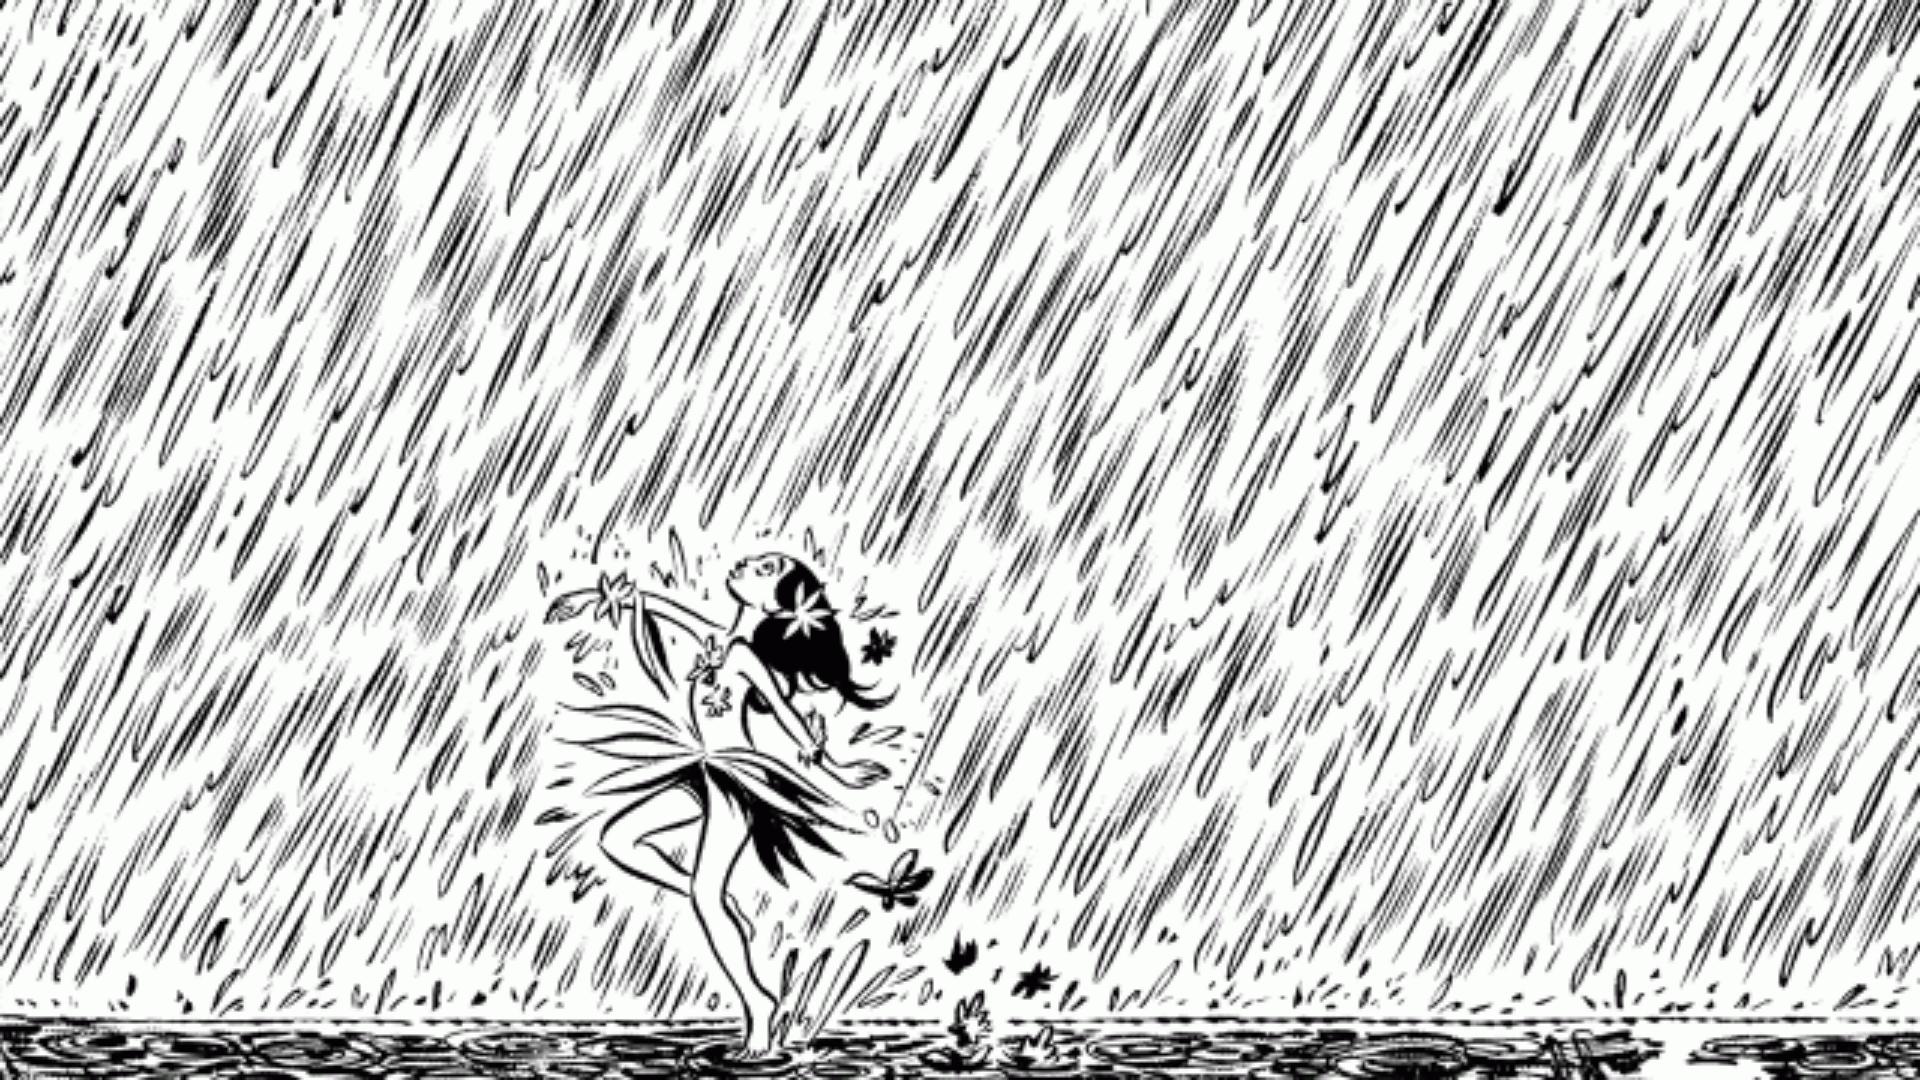 Graphic Novel Review – Habibi by Craig Thompson